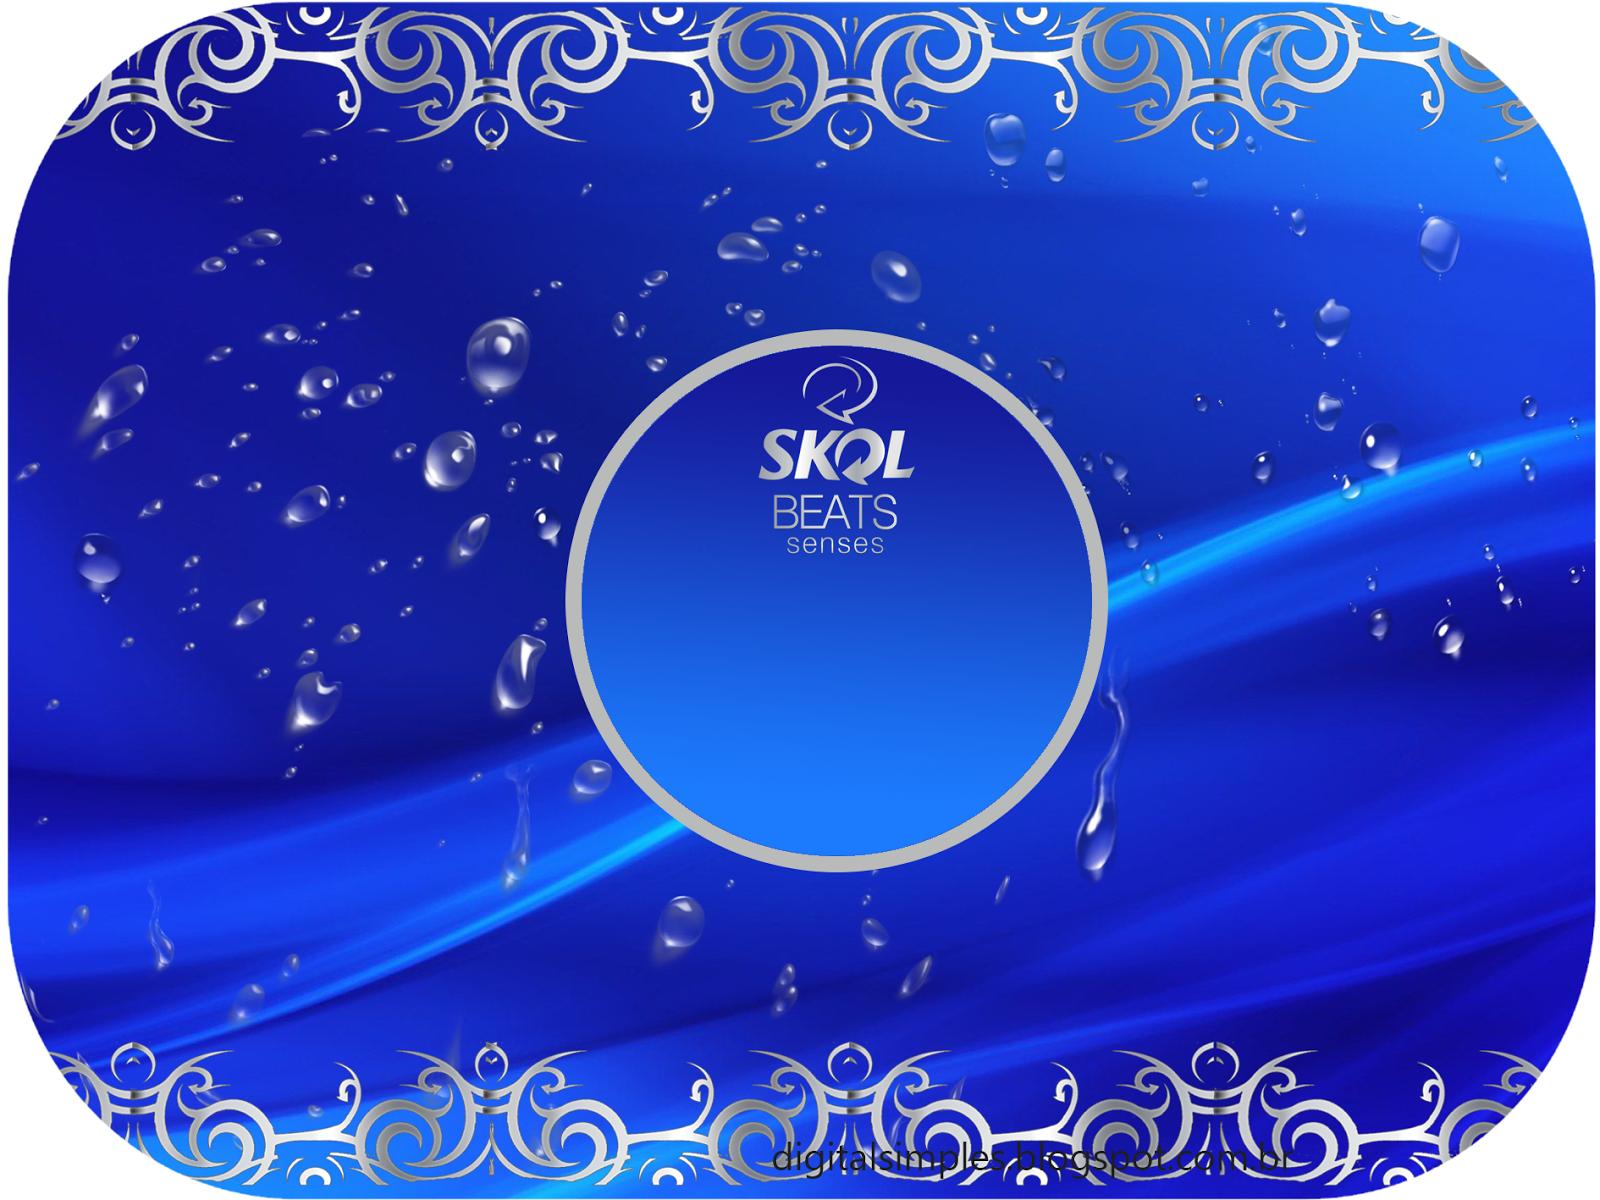 Kit Festa Aniversário Boteco Skol Beats Senses Convites Digitais